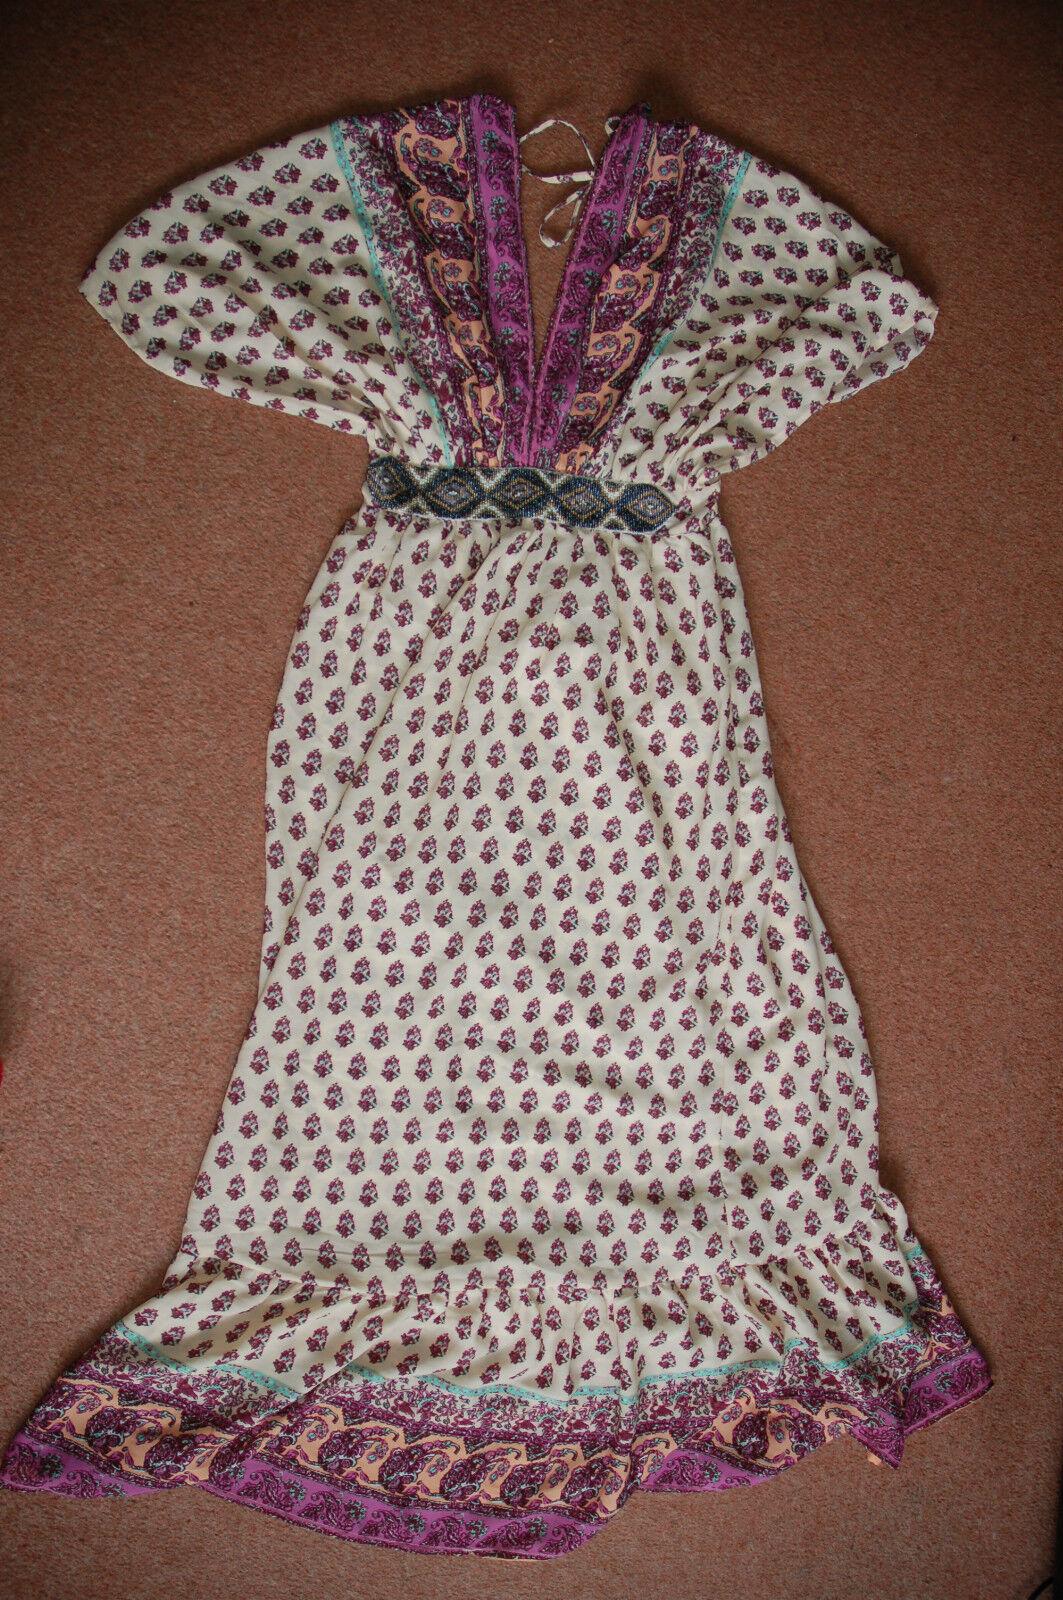 NOUVEAU 10 Anmoi Angel Sleeve Maxi Dress Beach Cover Up Perles Ceinture Avant Cool